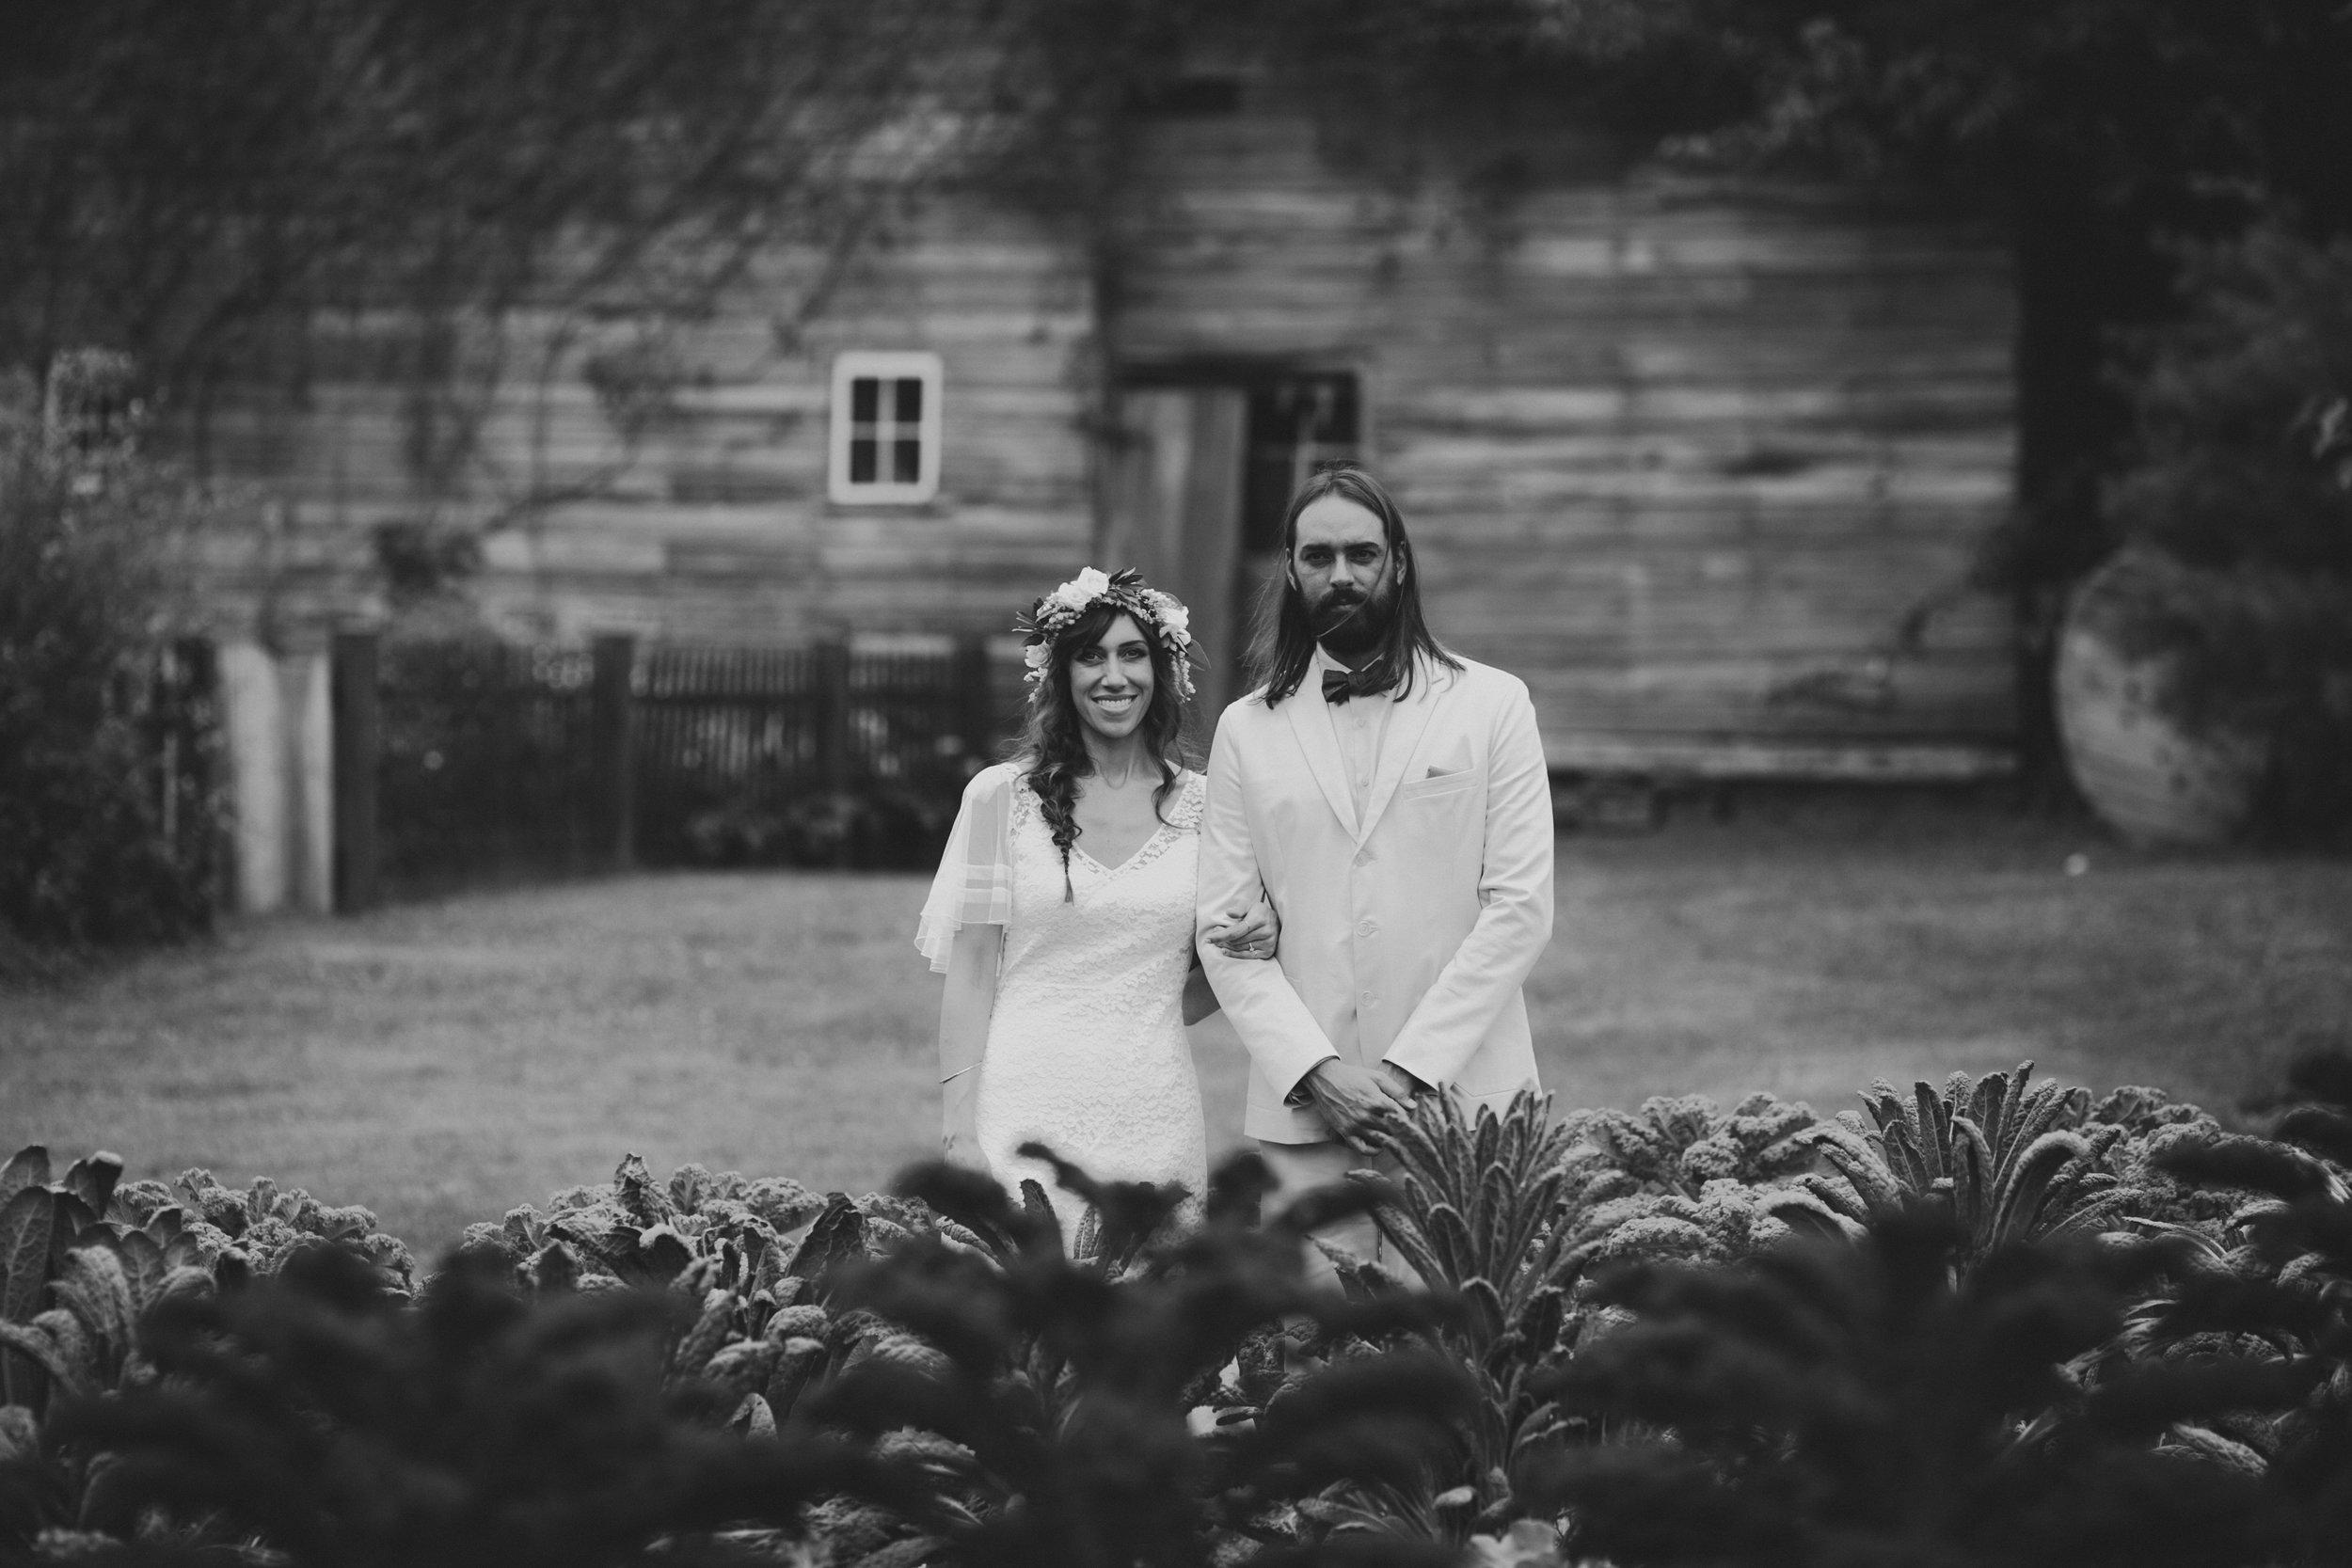 LIBERTY_VIEW_FARM_HIGHLAND_NY_WEDDING_CHELLISE_MICHAEL_PHOTOGRAPHY812.JPG